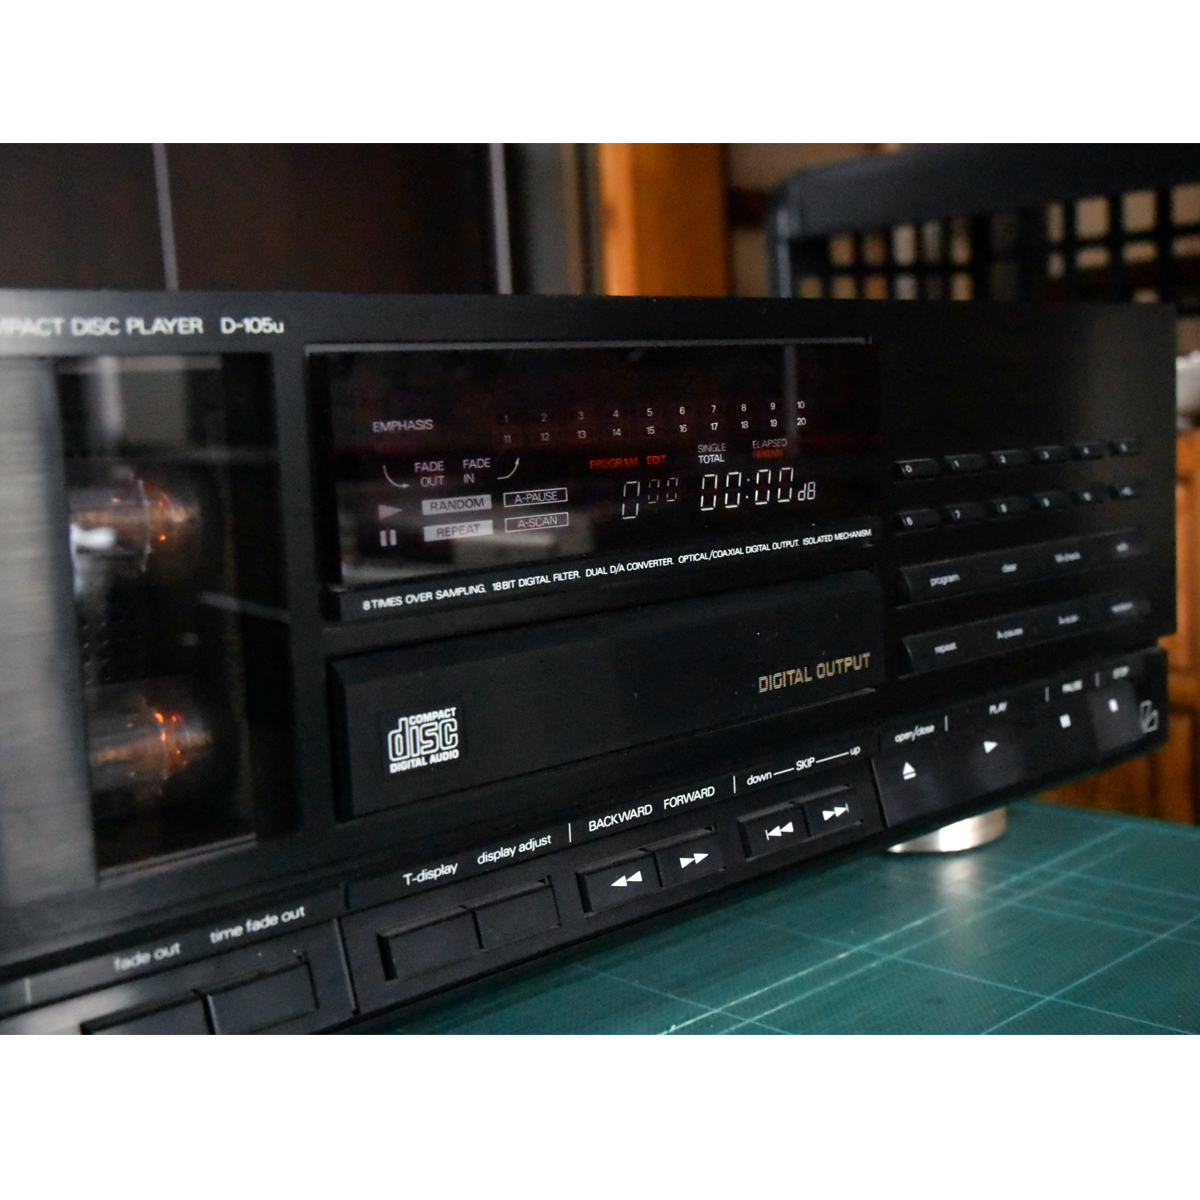 ALPINE/LUXMAN D-105u管球CDプレーヤー★ジャンク_画像2